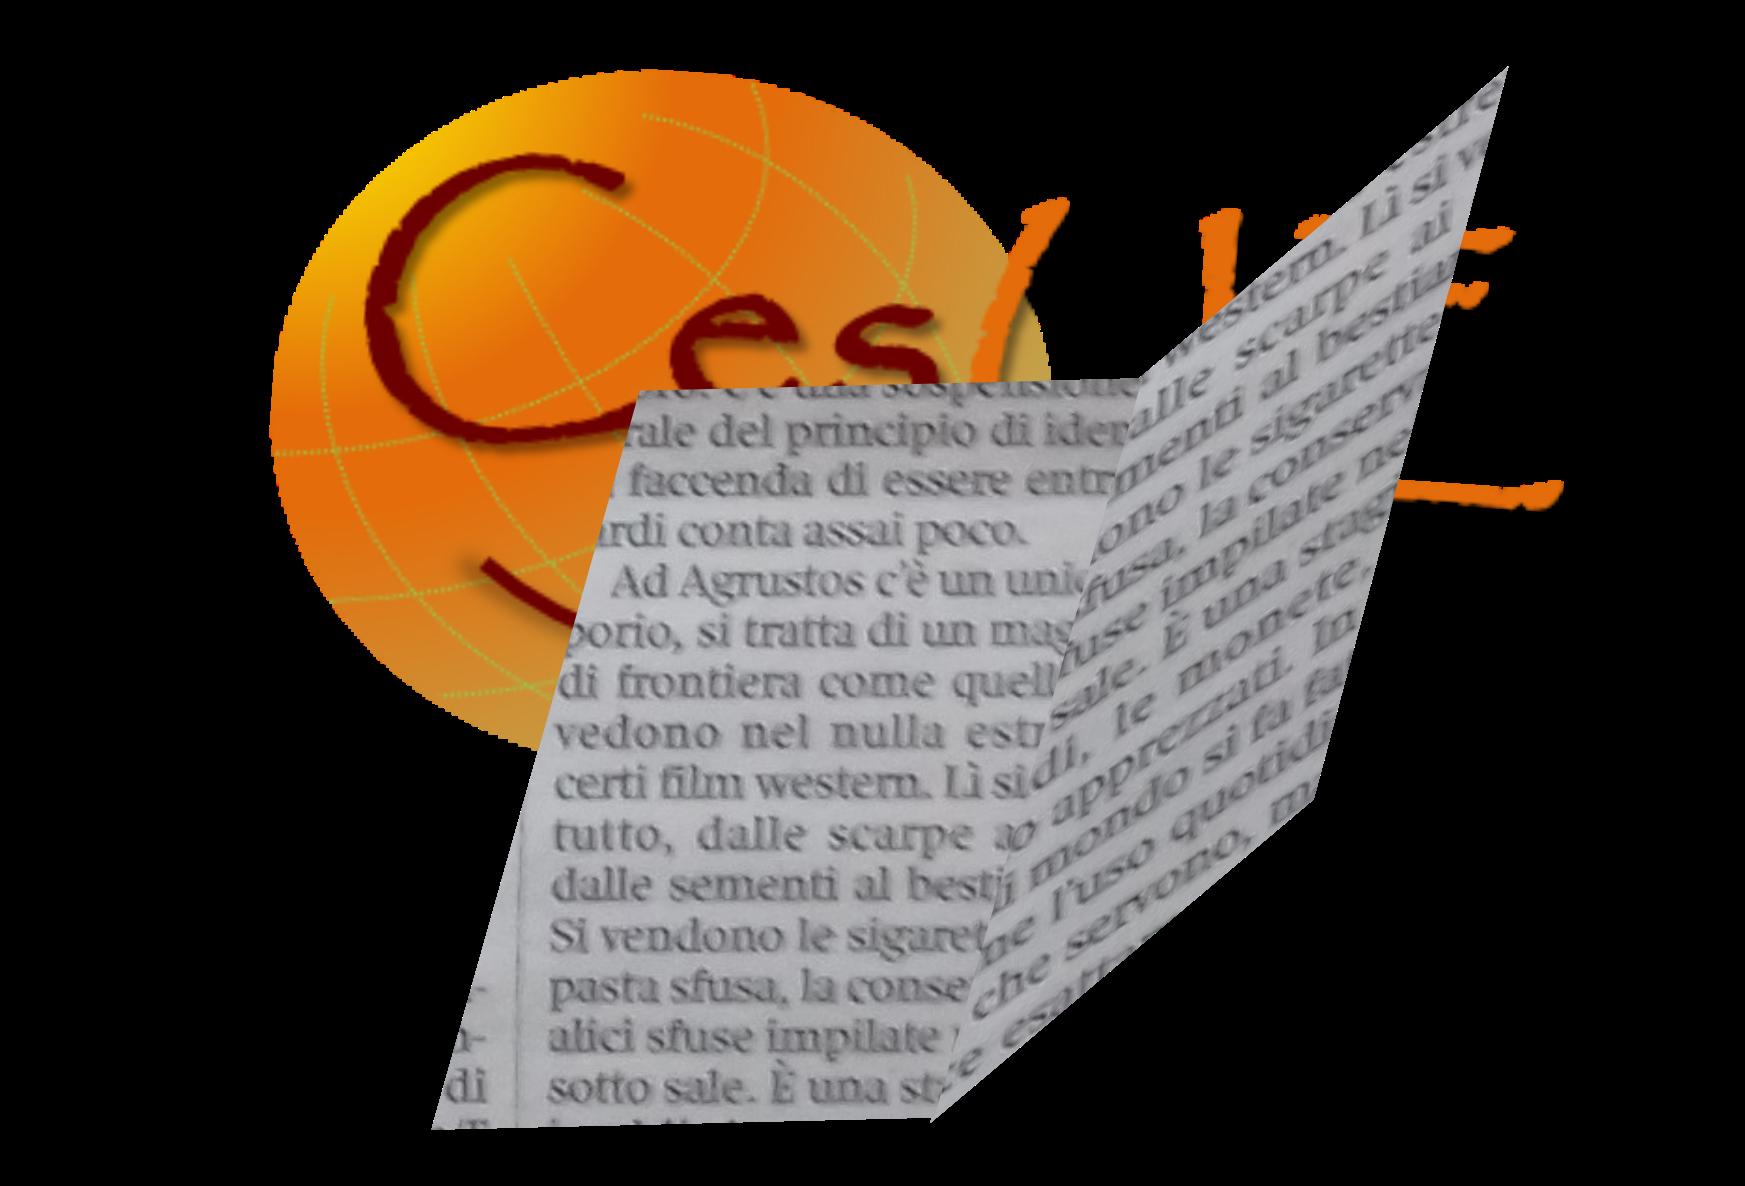 cesue sulla stampa